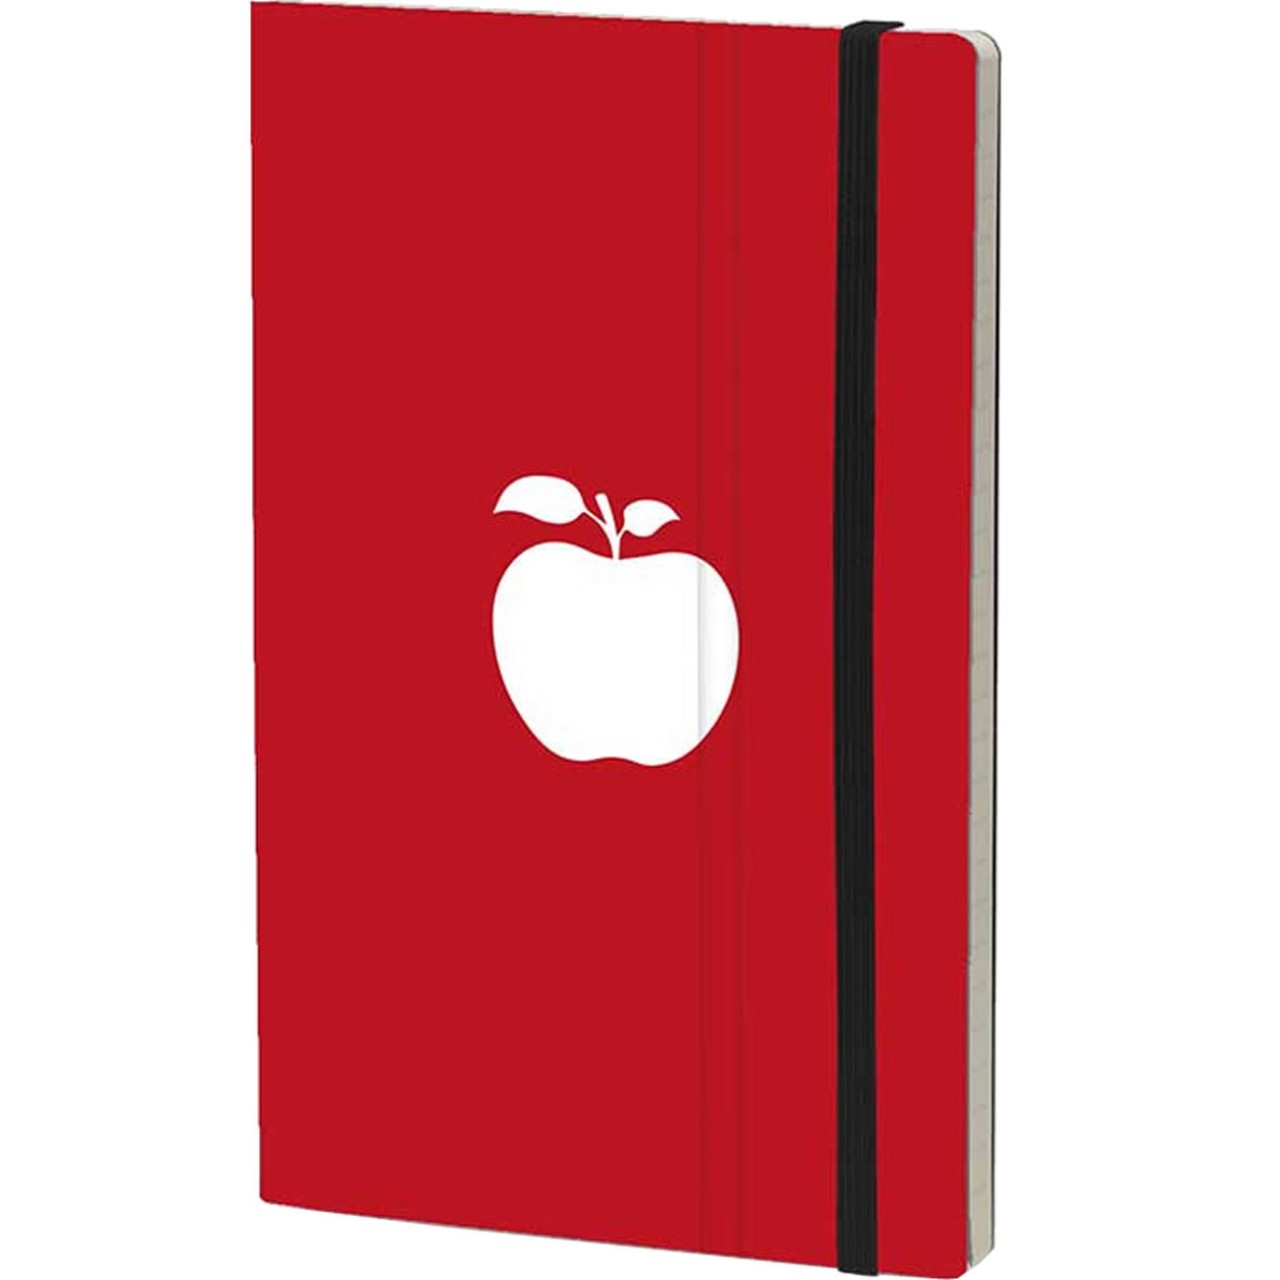 Stifflexible Notizbuch FRESH FRUIT 9 x 14 cm 144 S., APPLE